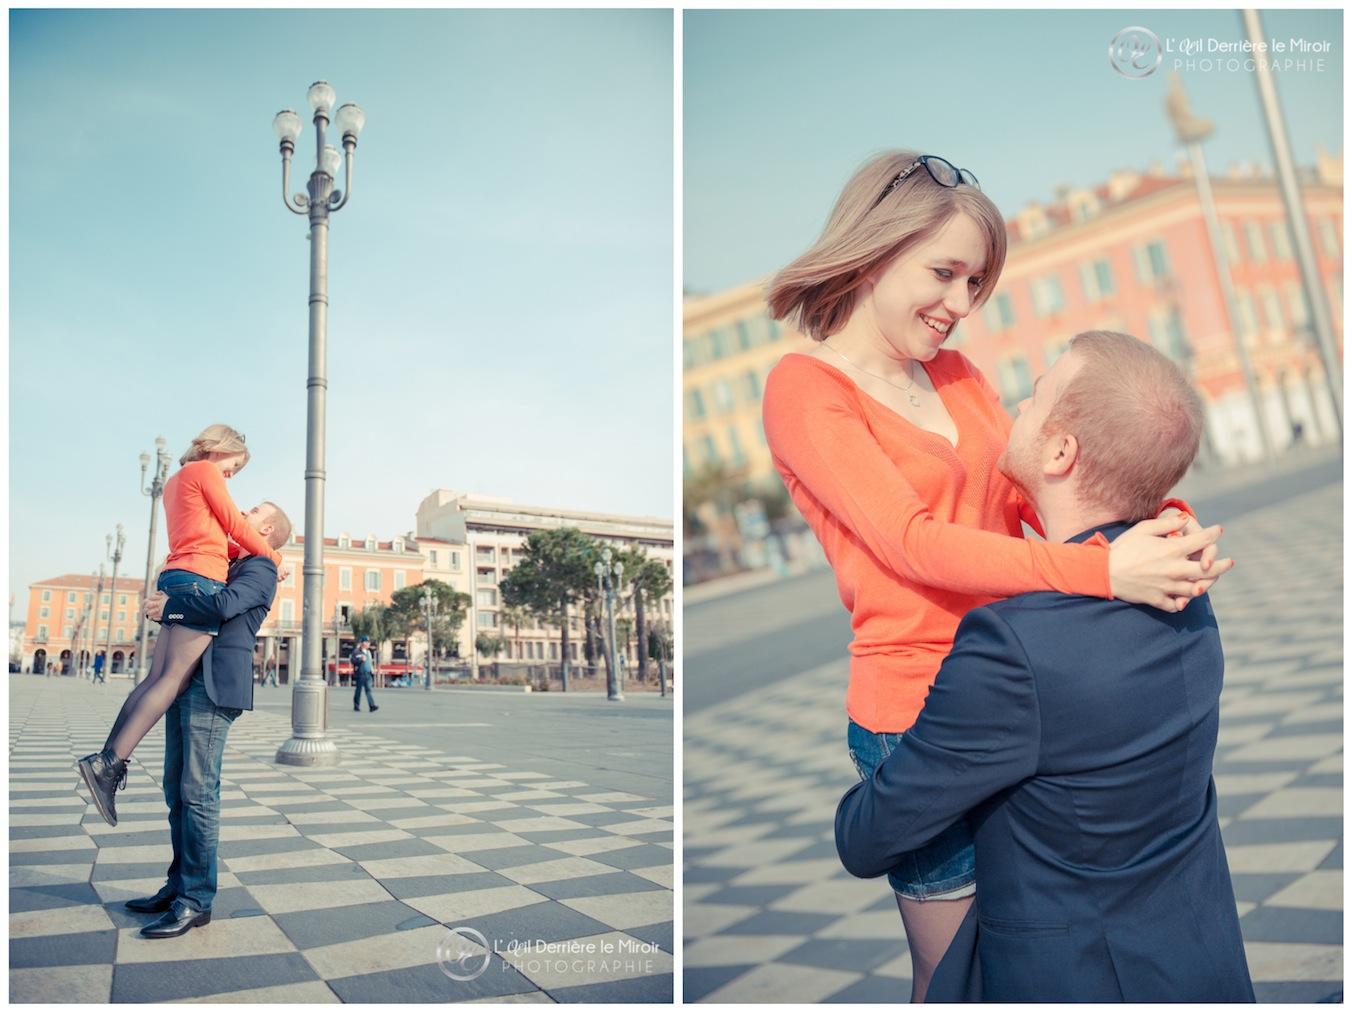 Photographe-couple-06-loeilderrierelemiroir-01